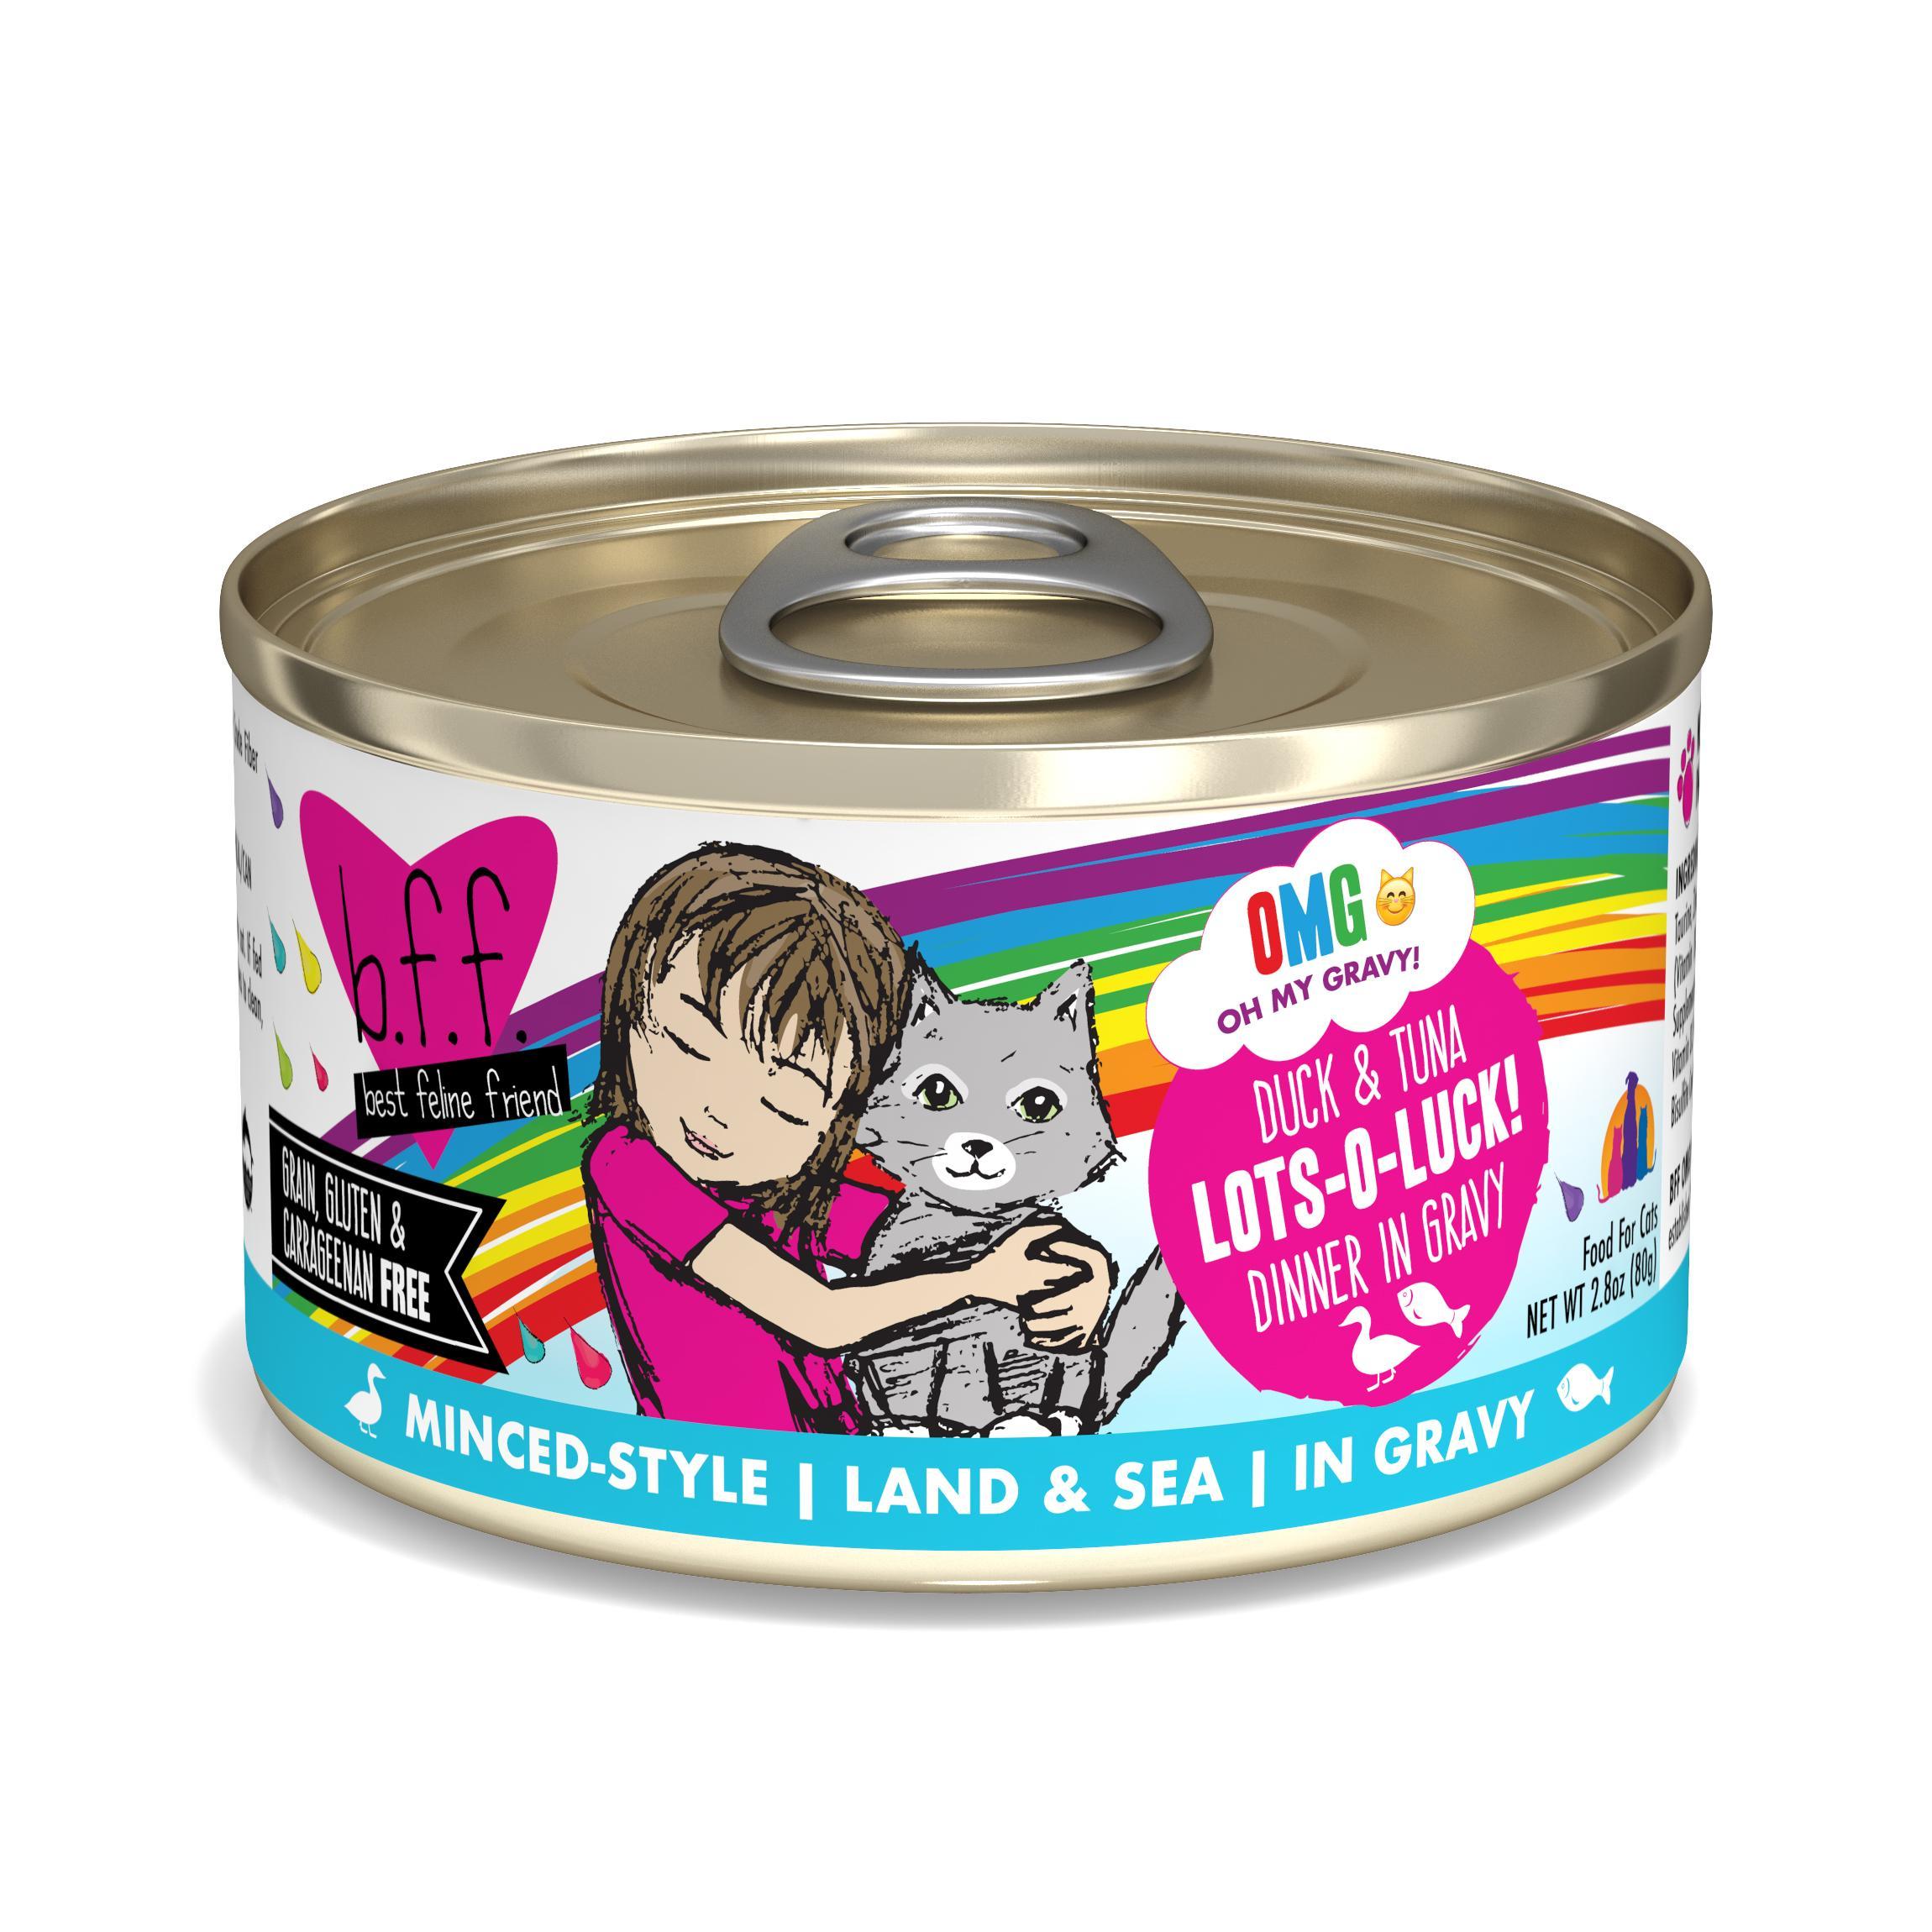 BFF Oh My Gravy! Lots-O-Luck! Duck & Tuna Dinner in Gravy Grain-Free Wet Cat Food Image